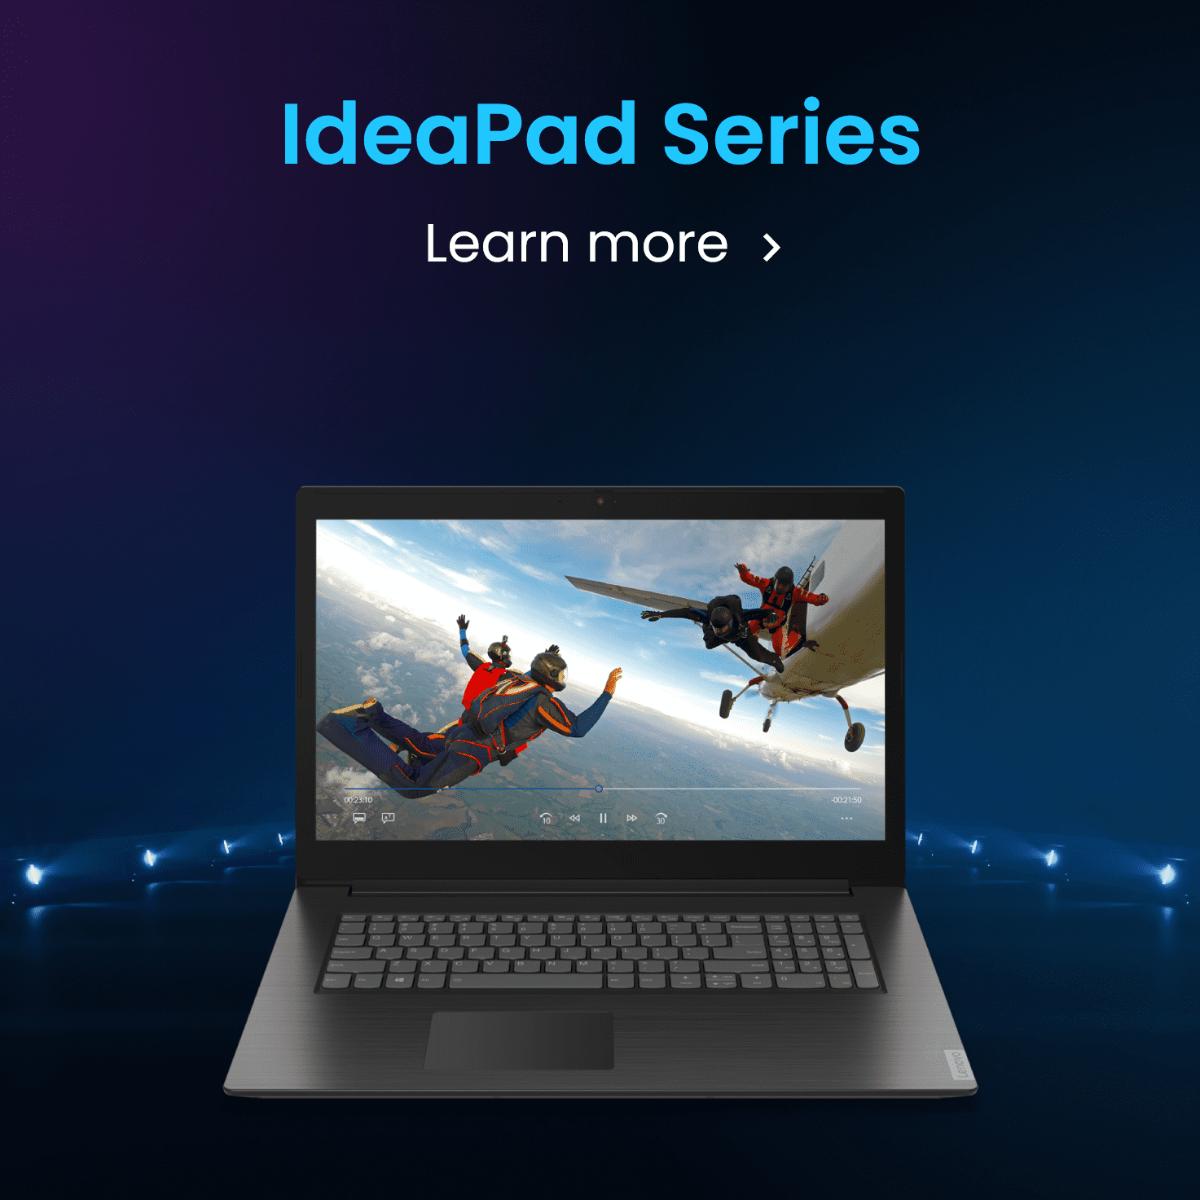 Ideapad Series